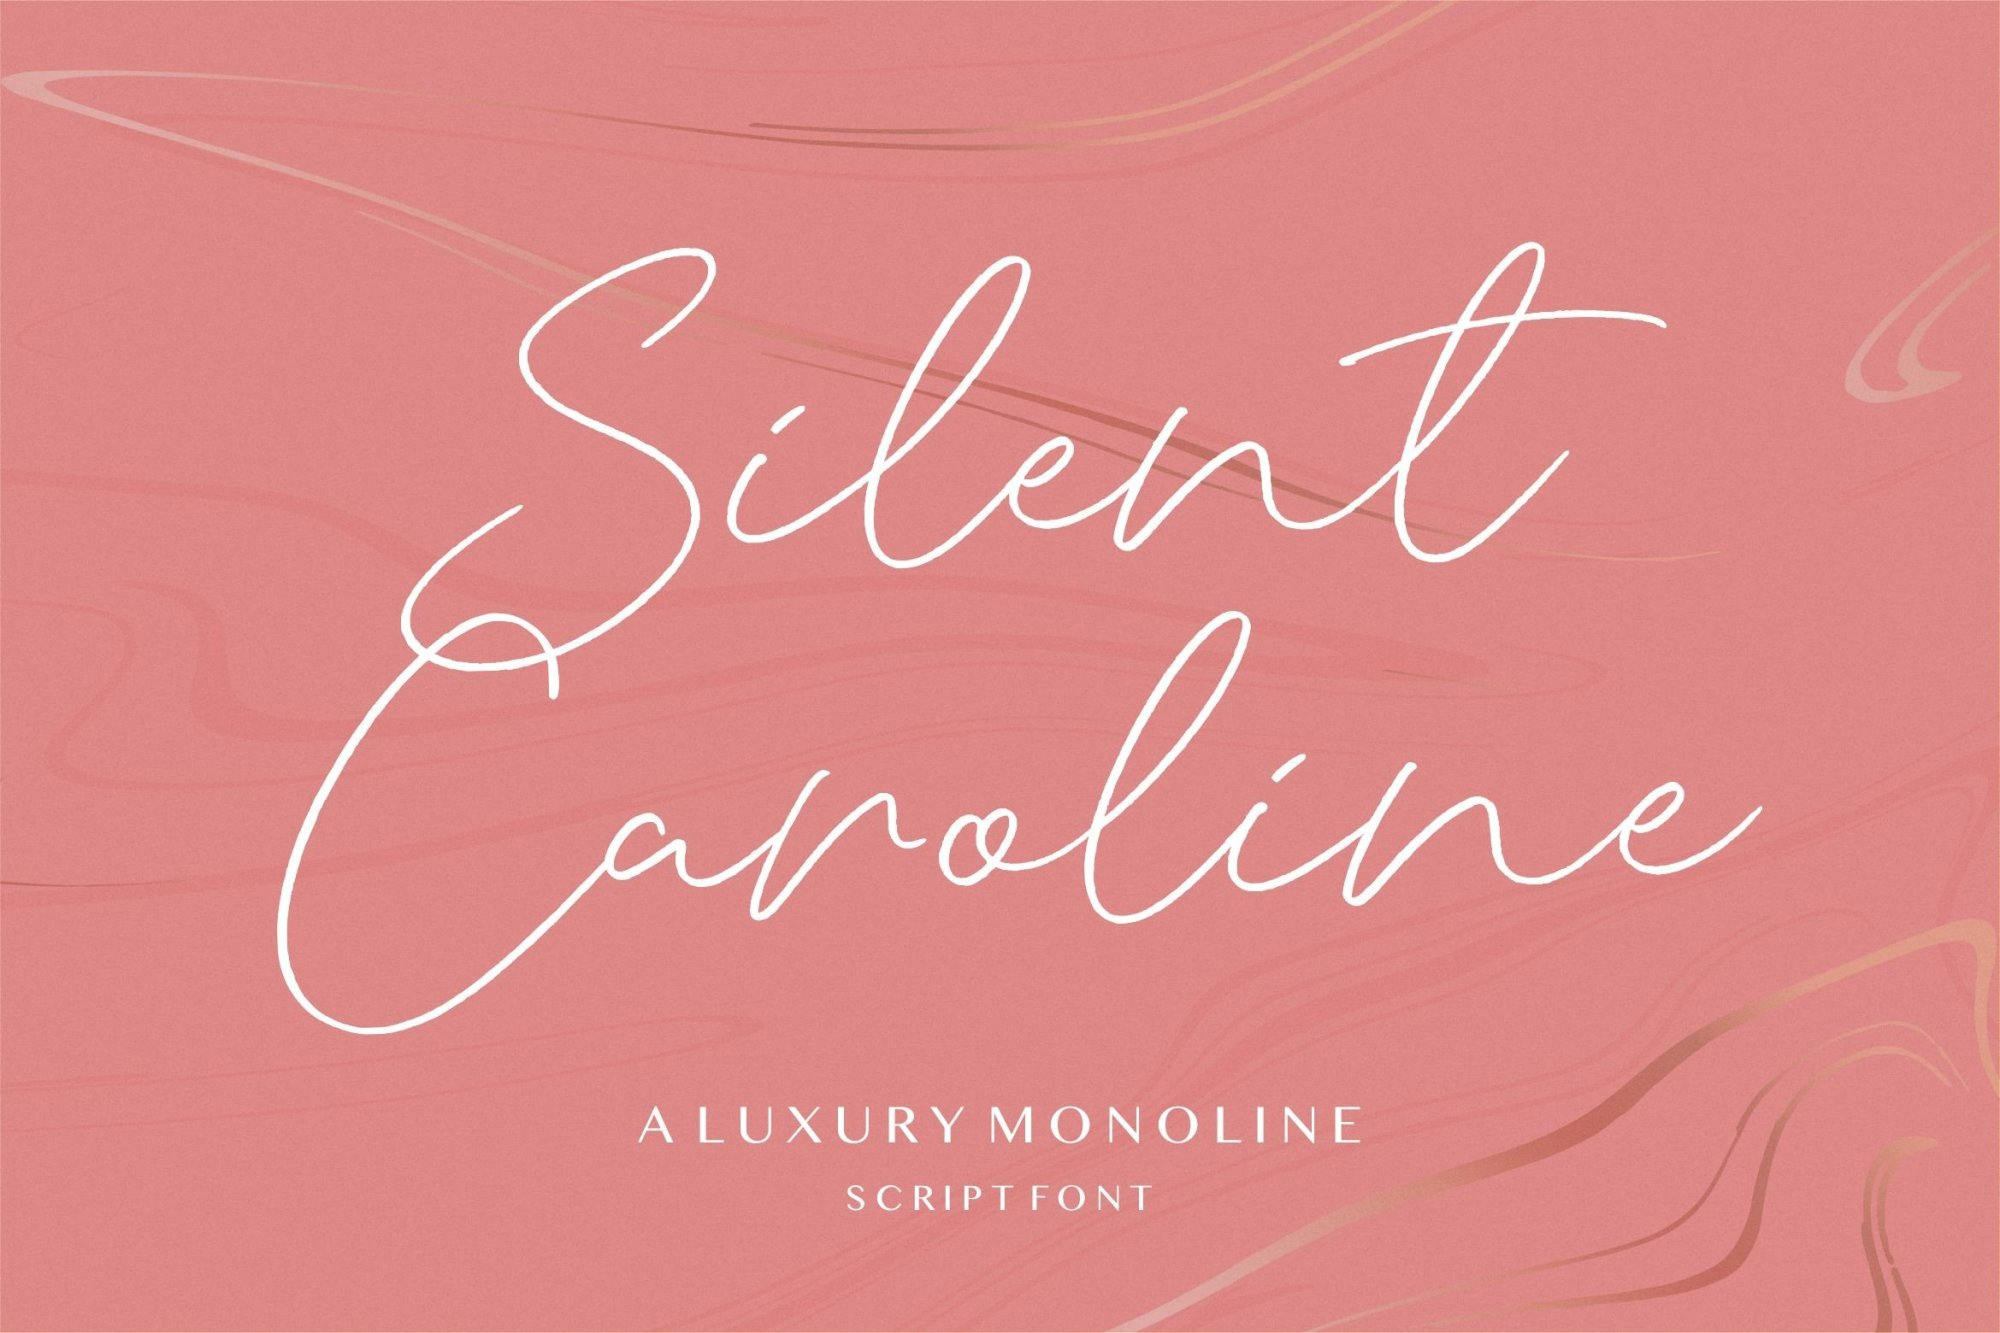 Silent-Caroline-Luxury-Script-Font-1